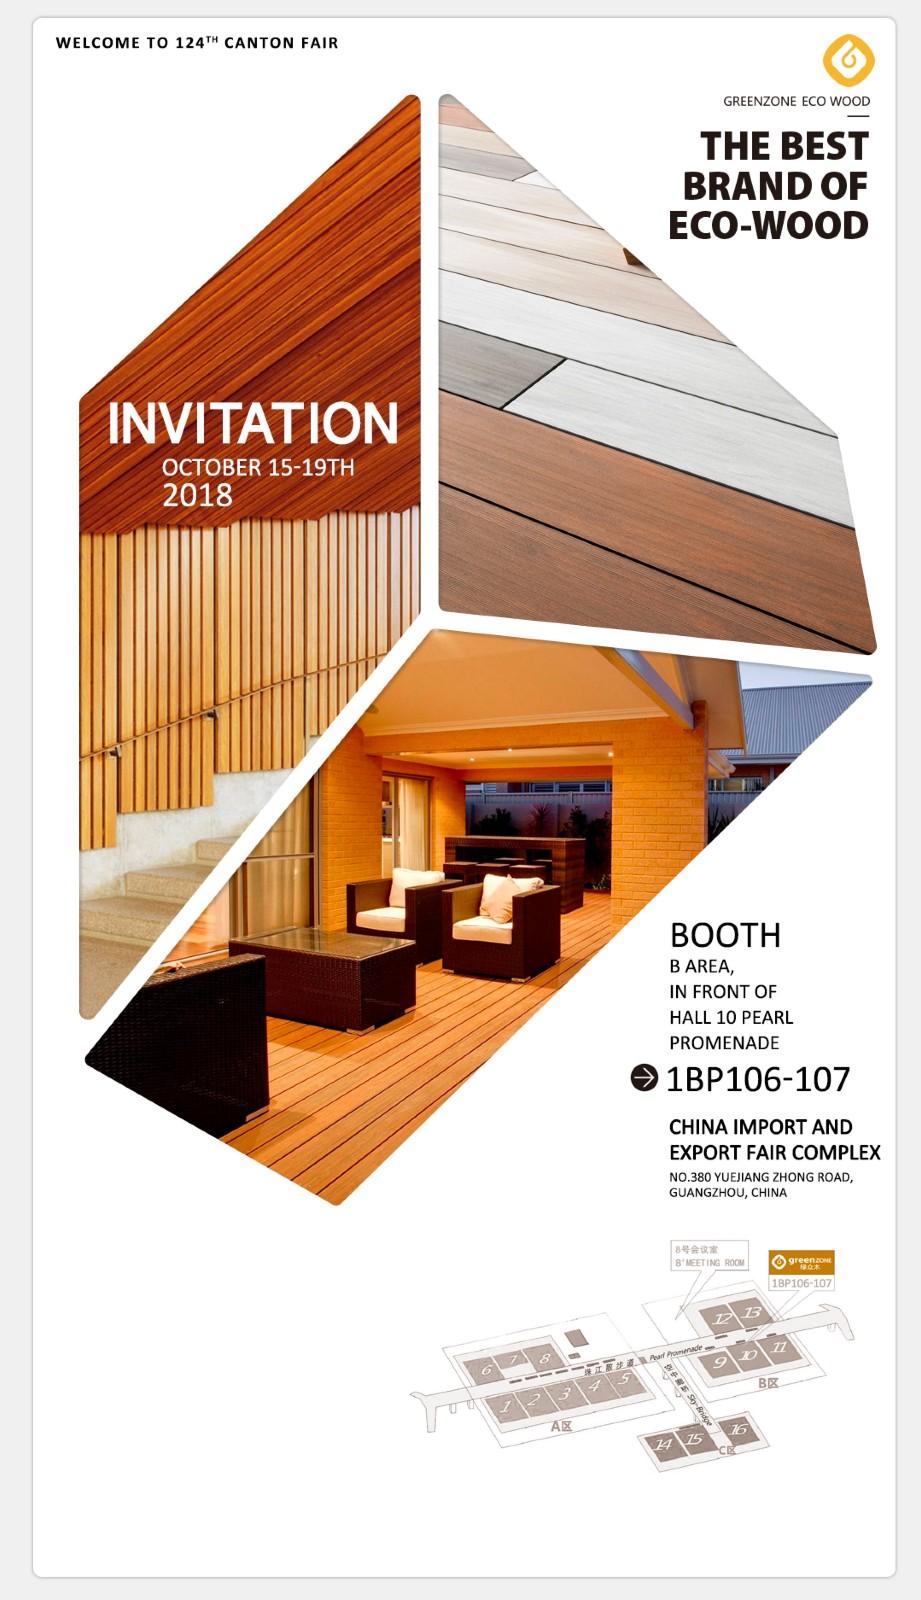 Greenzone-Invitation of Greenzone 124th Canton Fair 2018 | Marble Wall Art